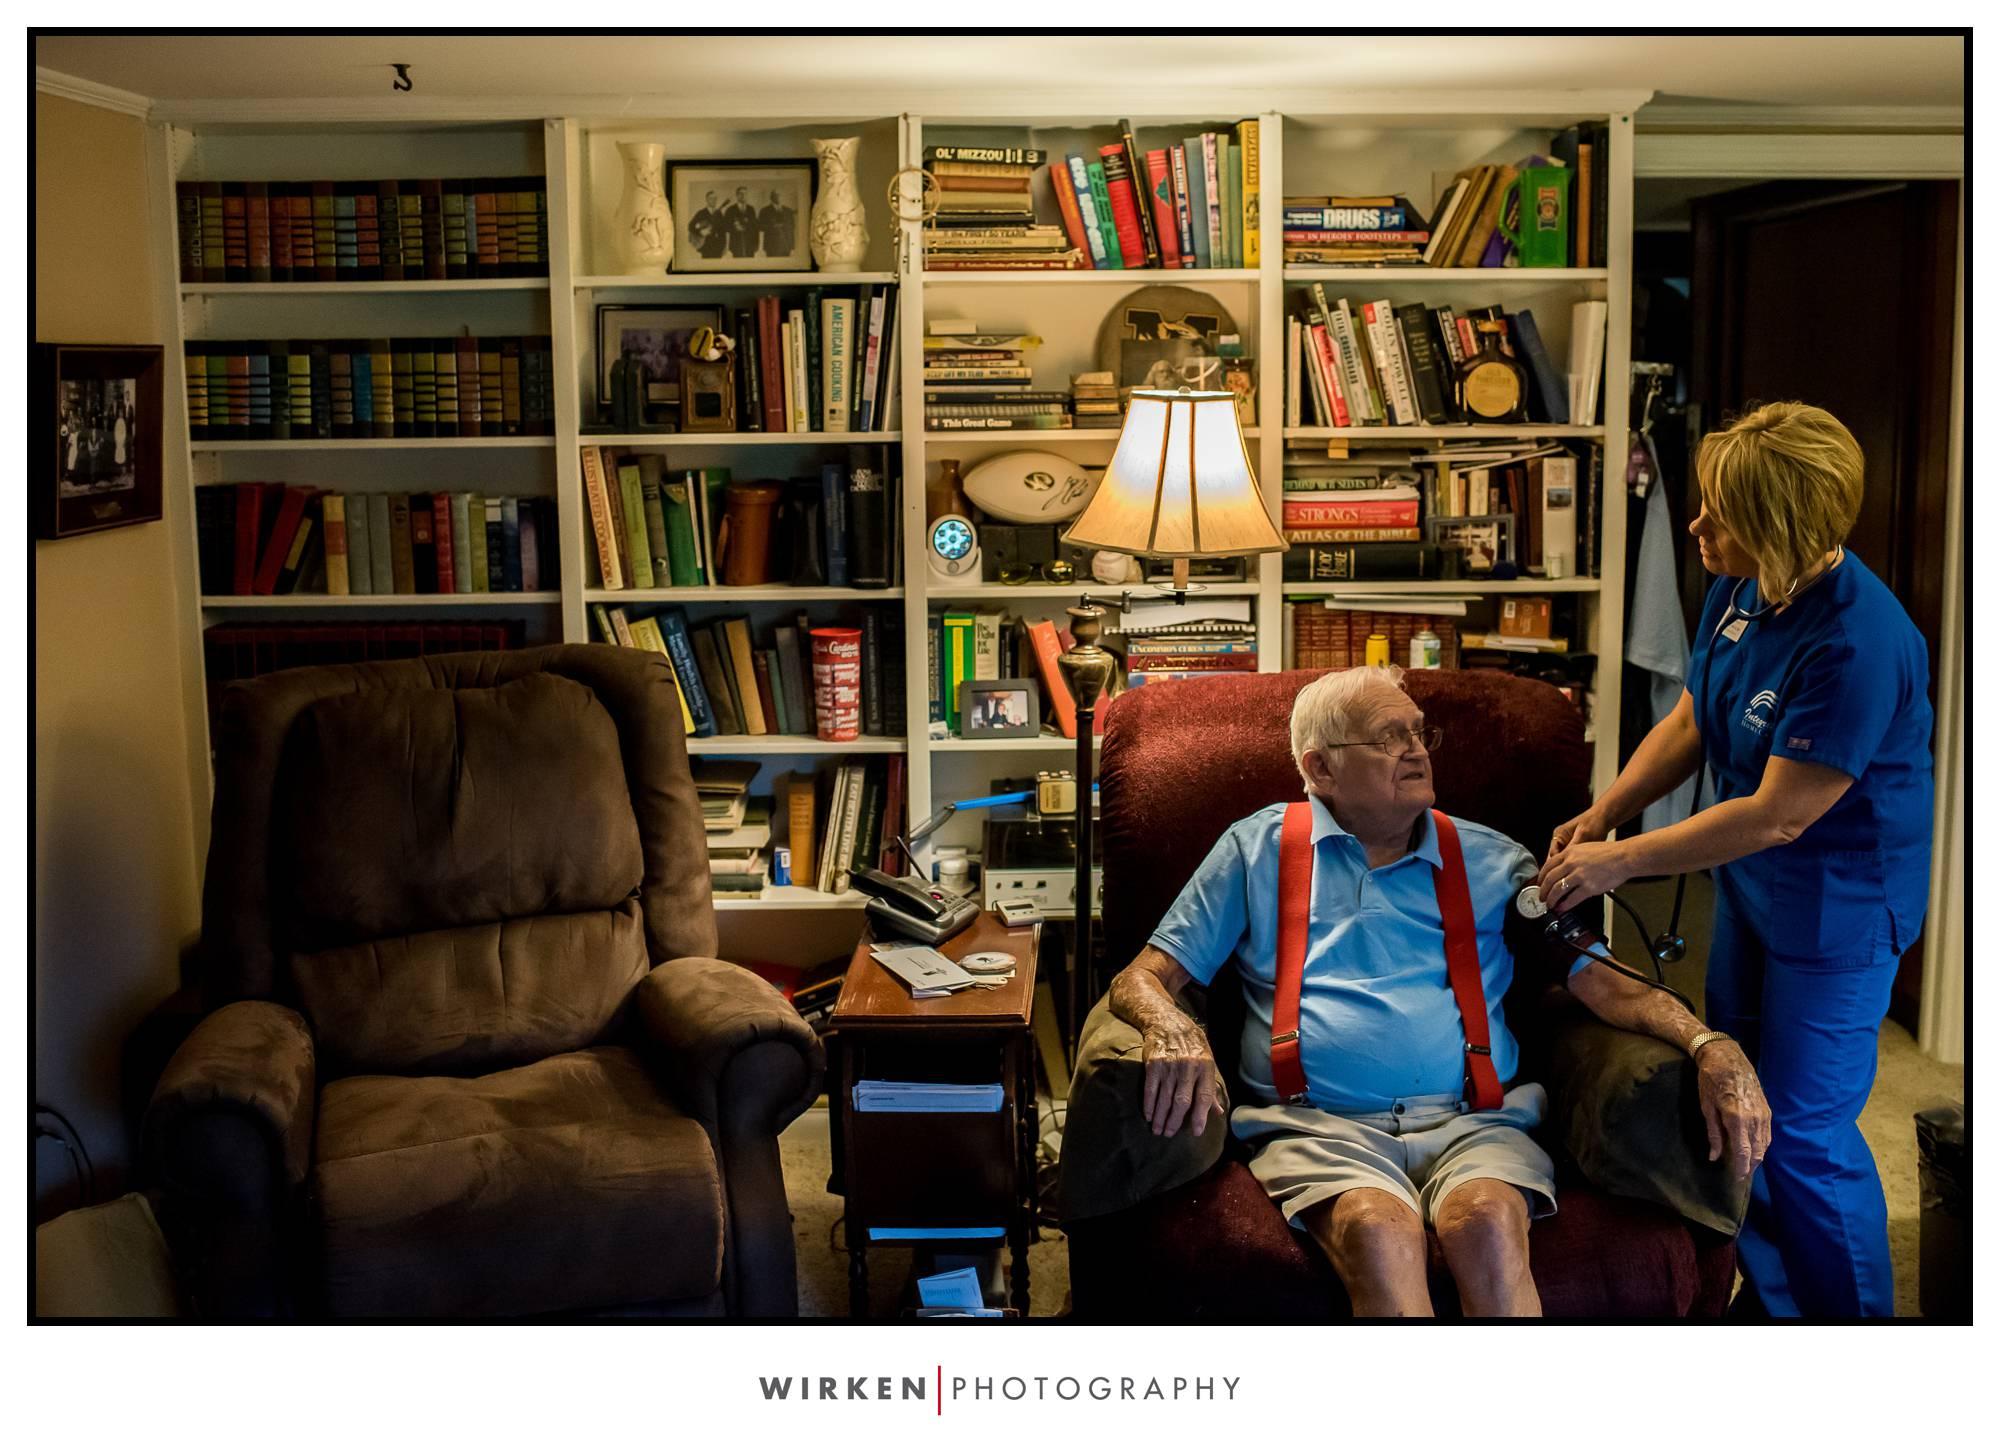 Commercial Photographer Tyler Wirken of Wirken Photo documents Integrity Homecare in Kansas City